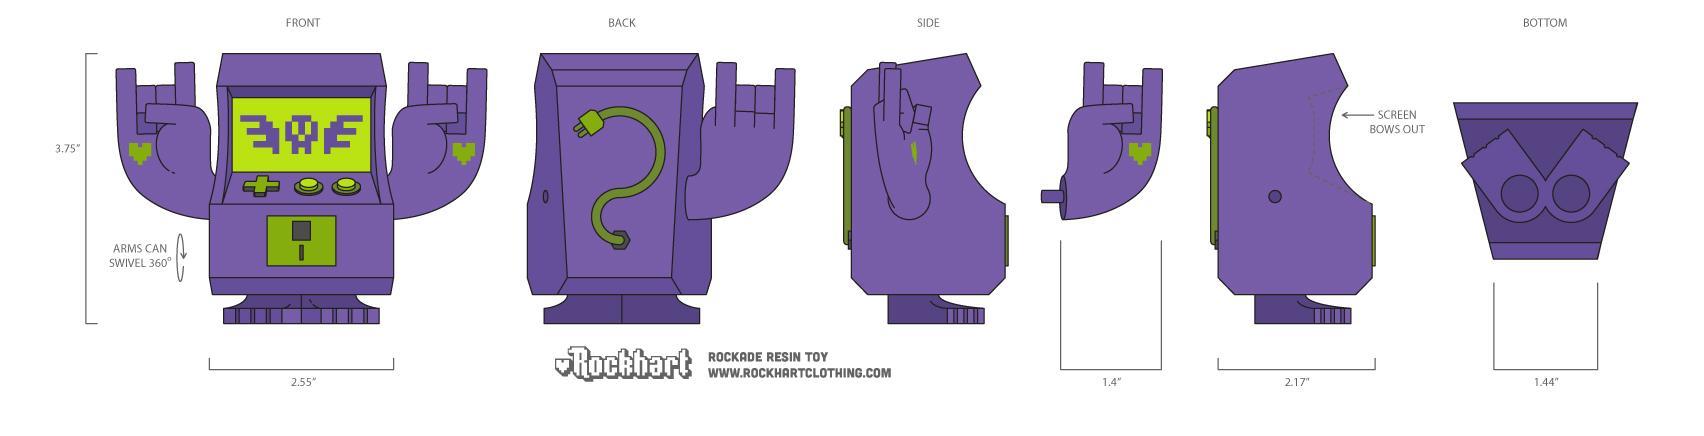 Rockade  - image 8 - student project